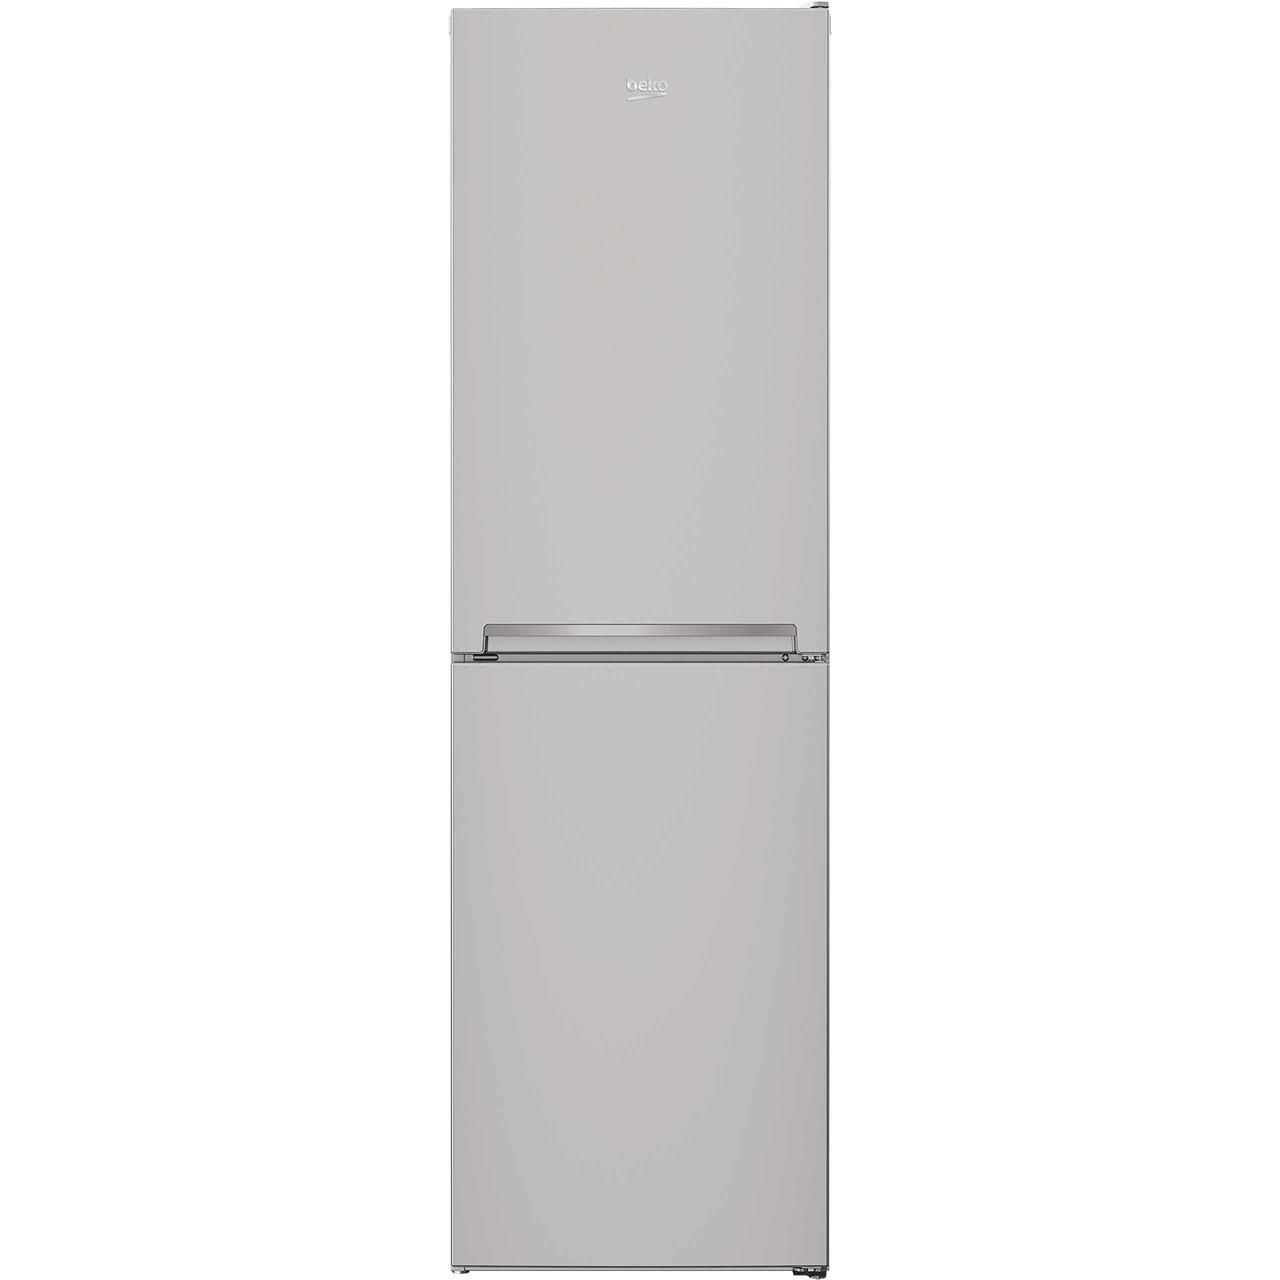 Beko CFG1582S Free Standing Fridge Freezer Frost Free in Silver